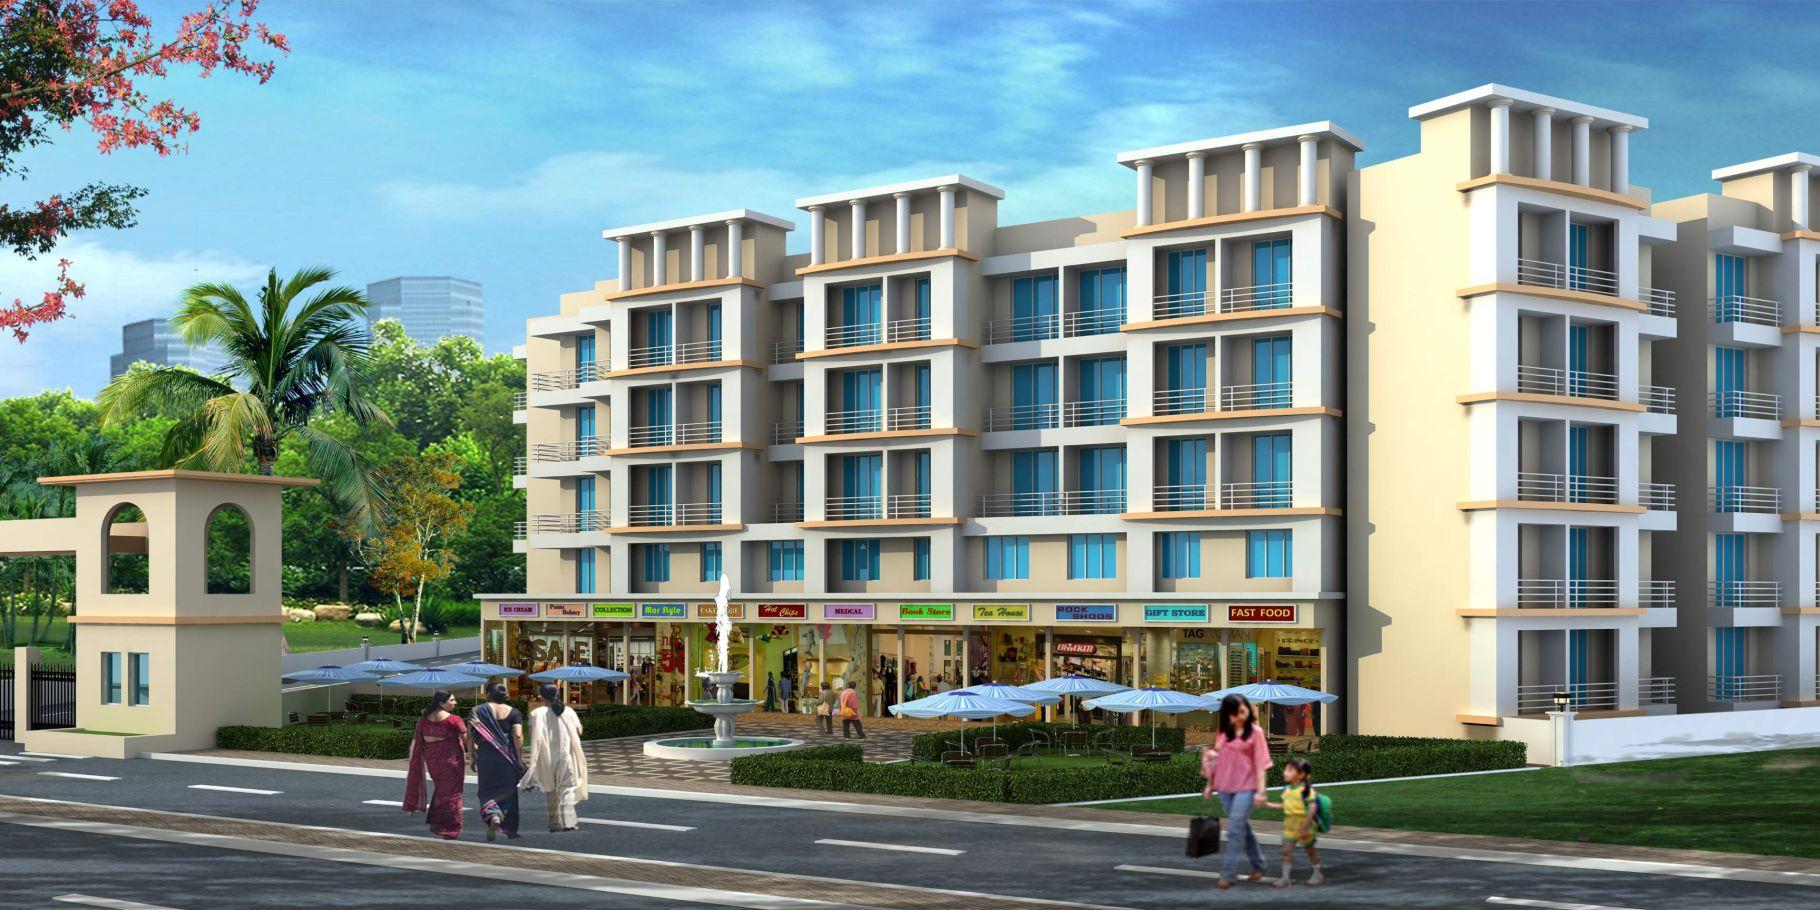 1Rk & 1 BHK Flats in Vangani Panvel Mumbai in Himalaya Gardens - Sqmtrs